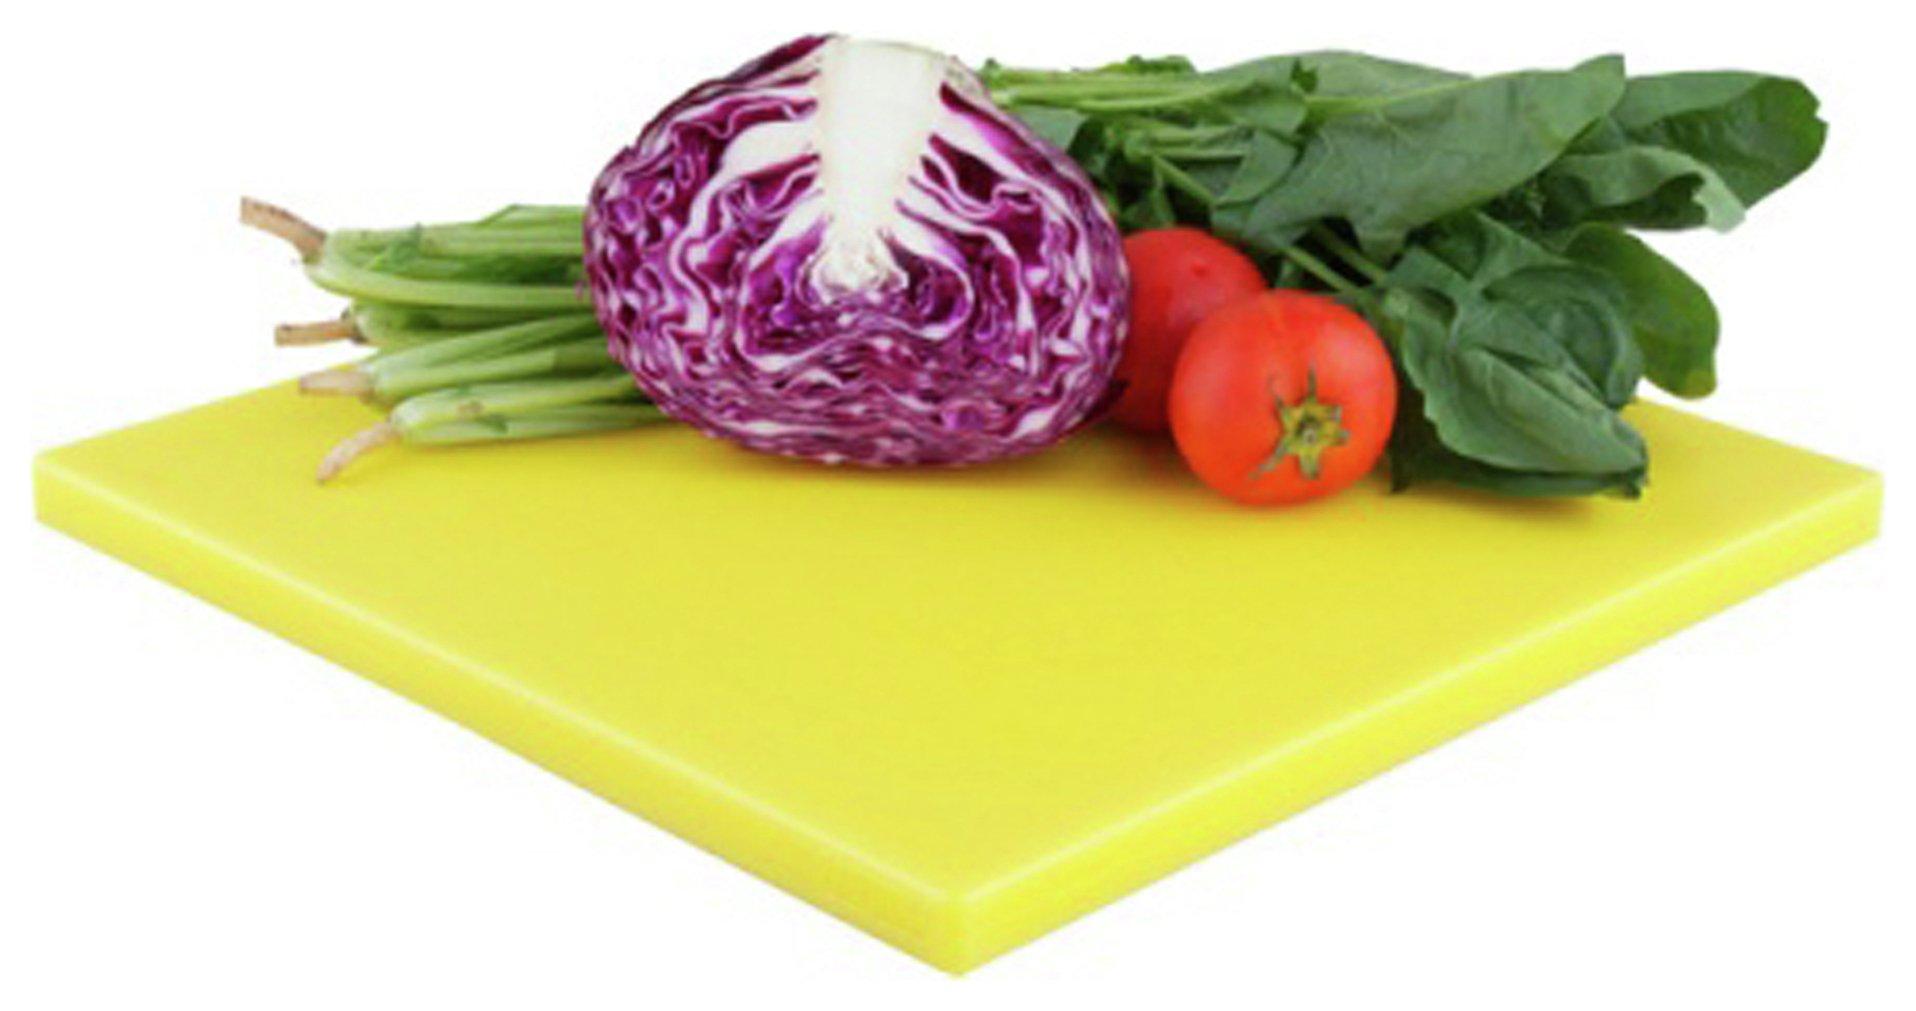 zanussi-polyethylene-cutting-board-yellow